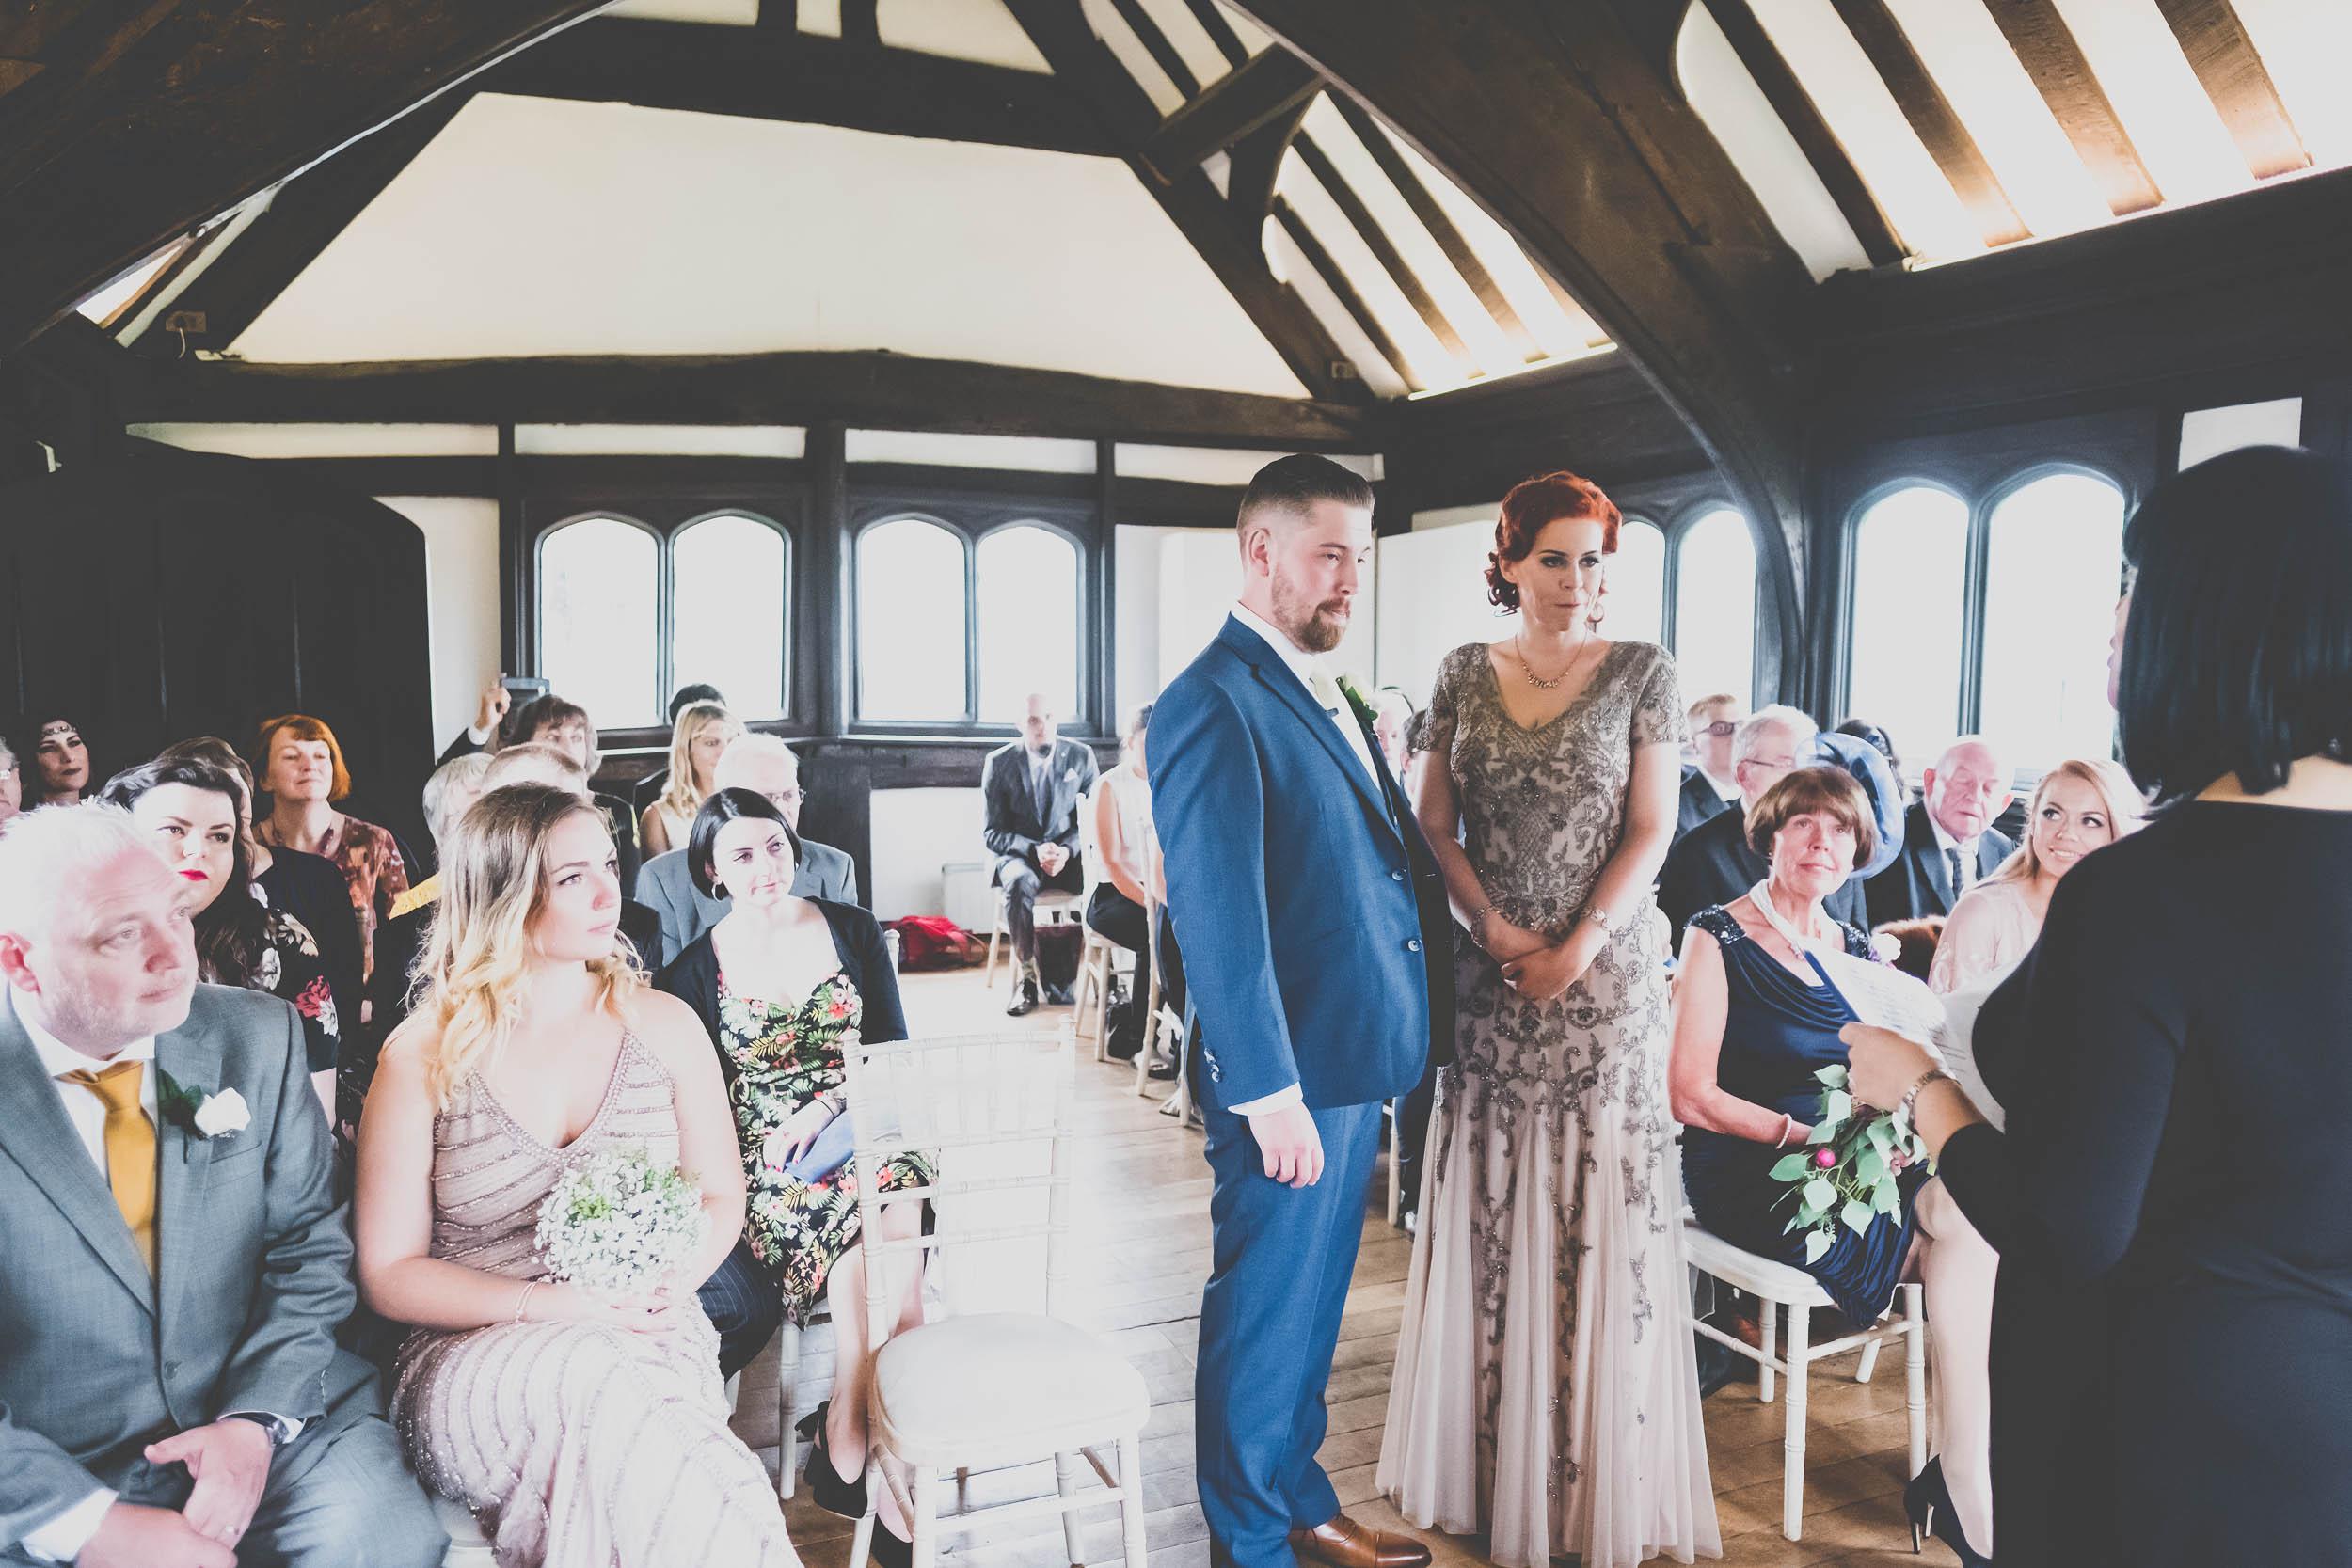 queen-elizabeths-hunting-lodge-epping-forest-wedding102.jpg